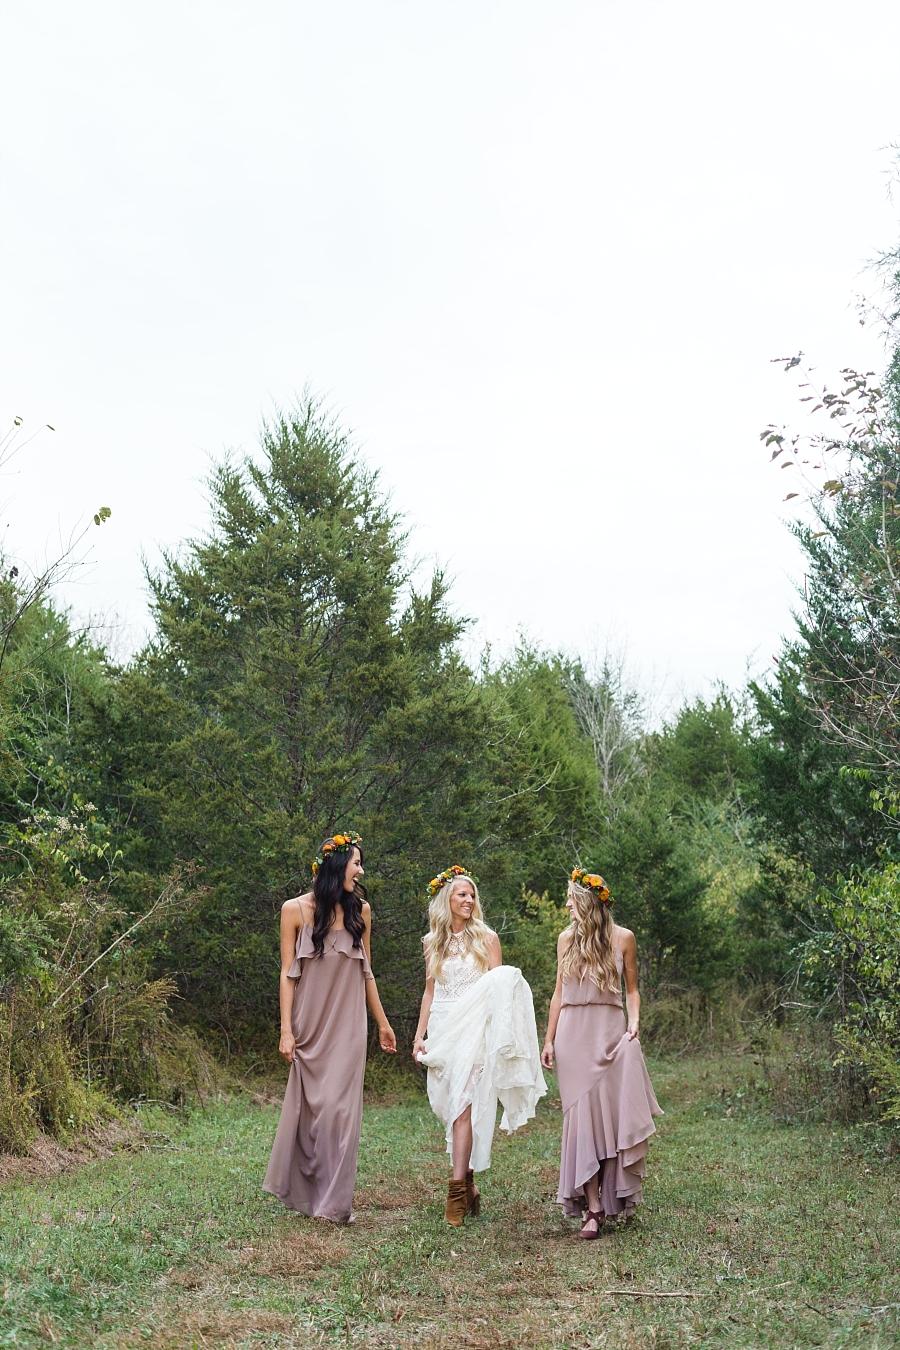 Stacy-Anderson-Photography-Cedarwood-Weddings-Nashville-Destination-Wedding-Photographer_0064.jpg